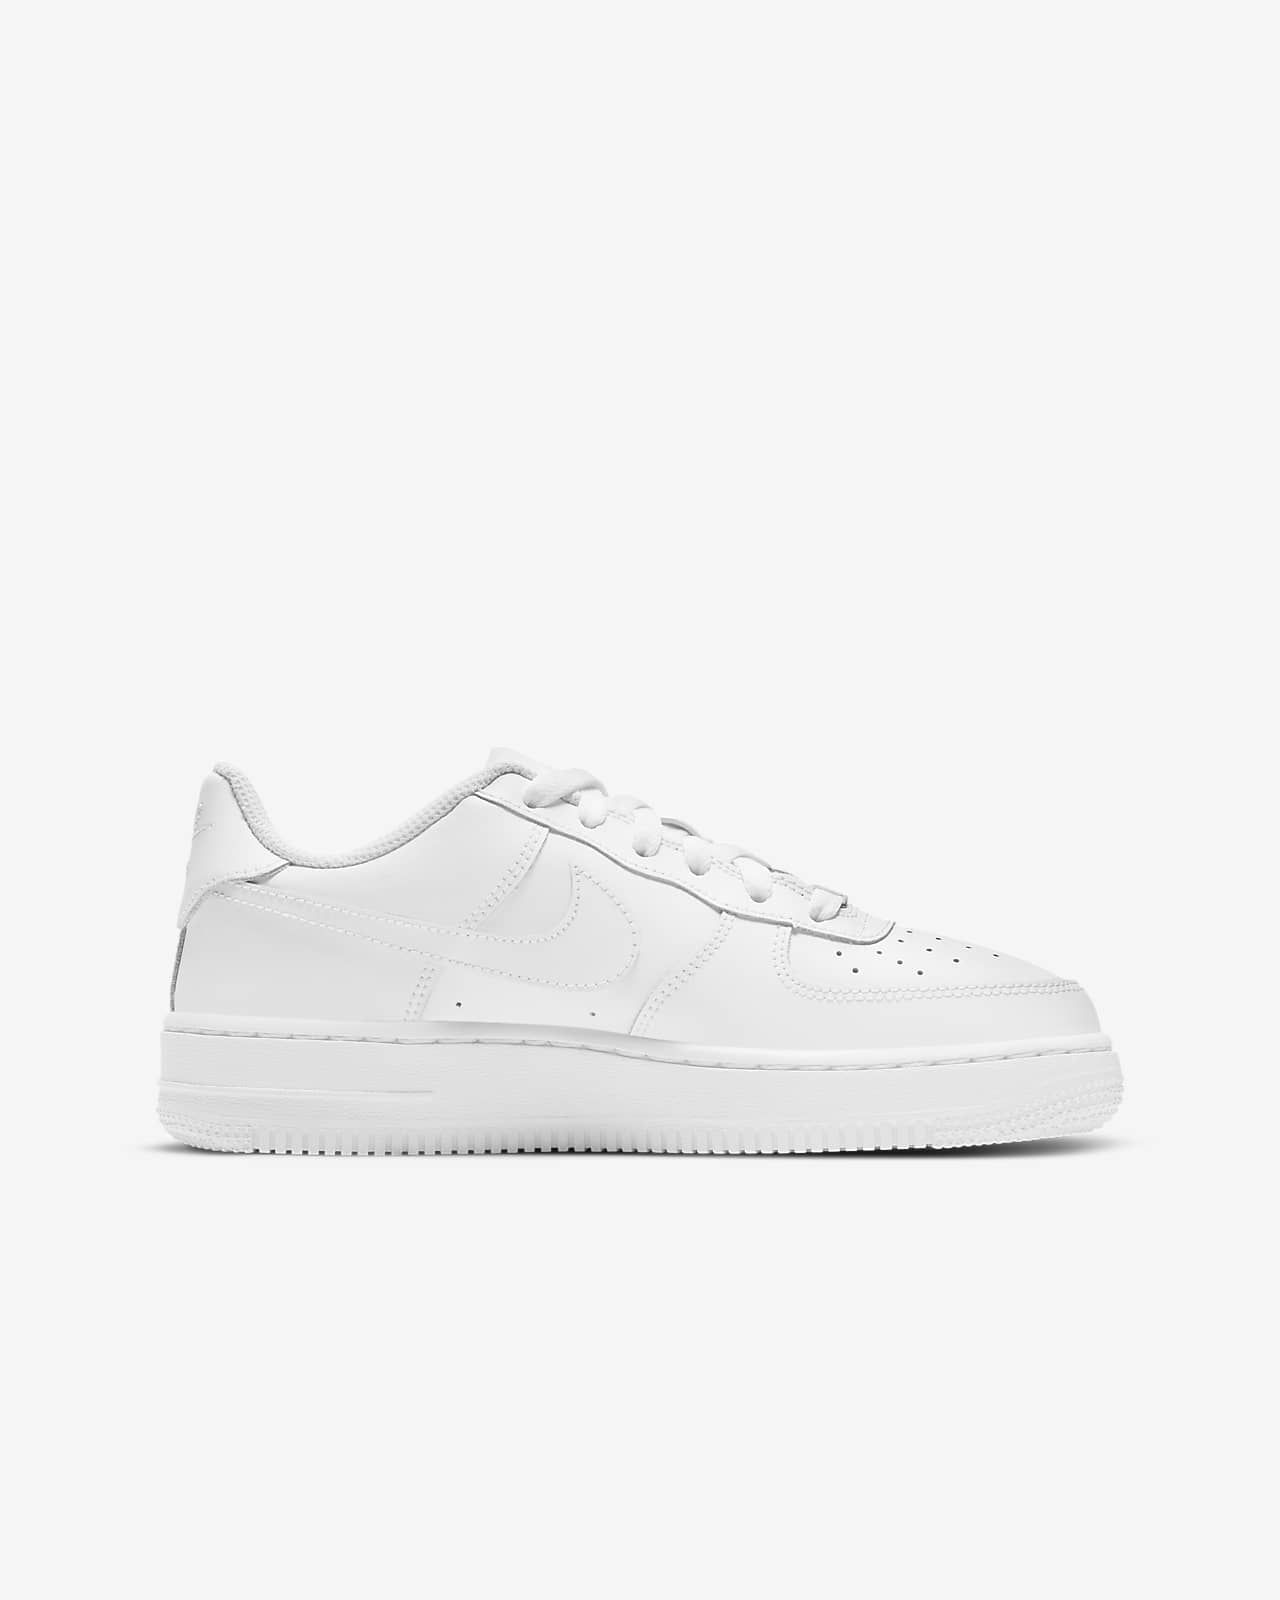 Nike Air Force 1 LE Big Kids' Shoe